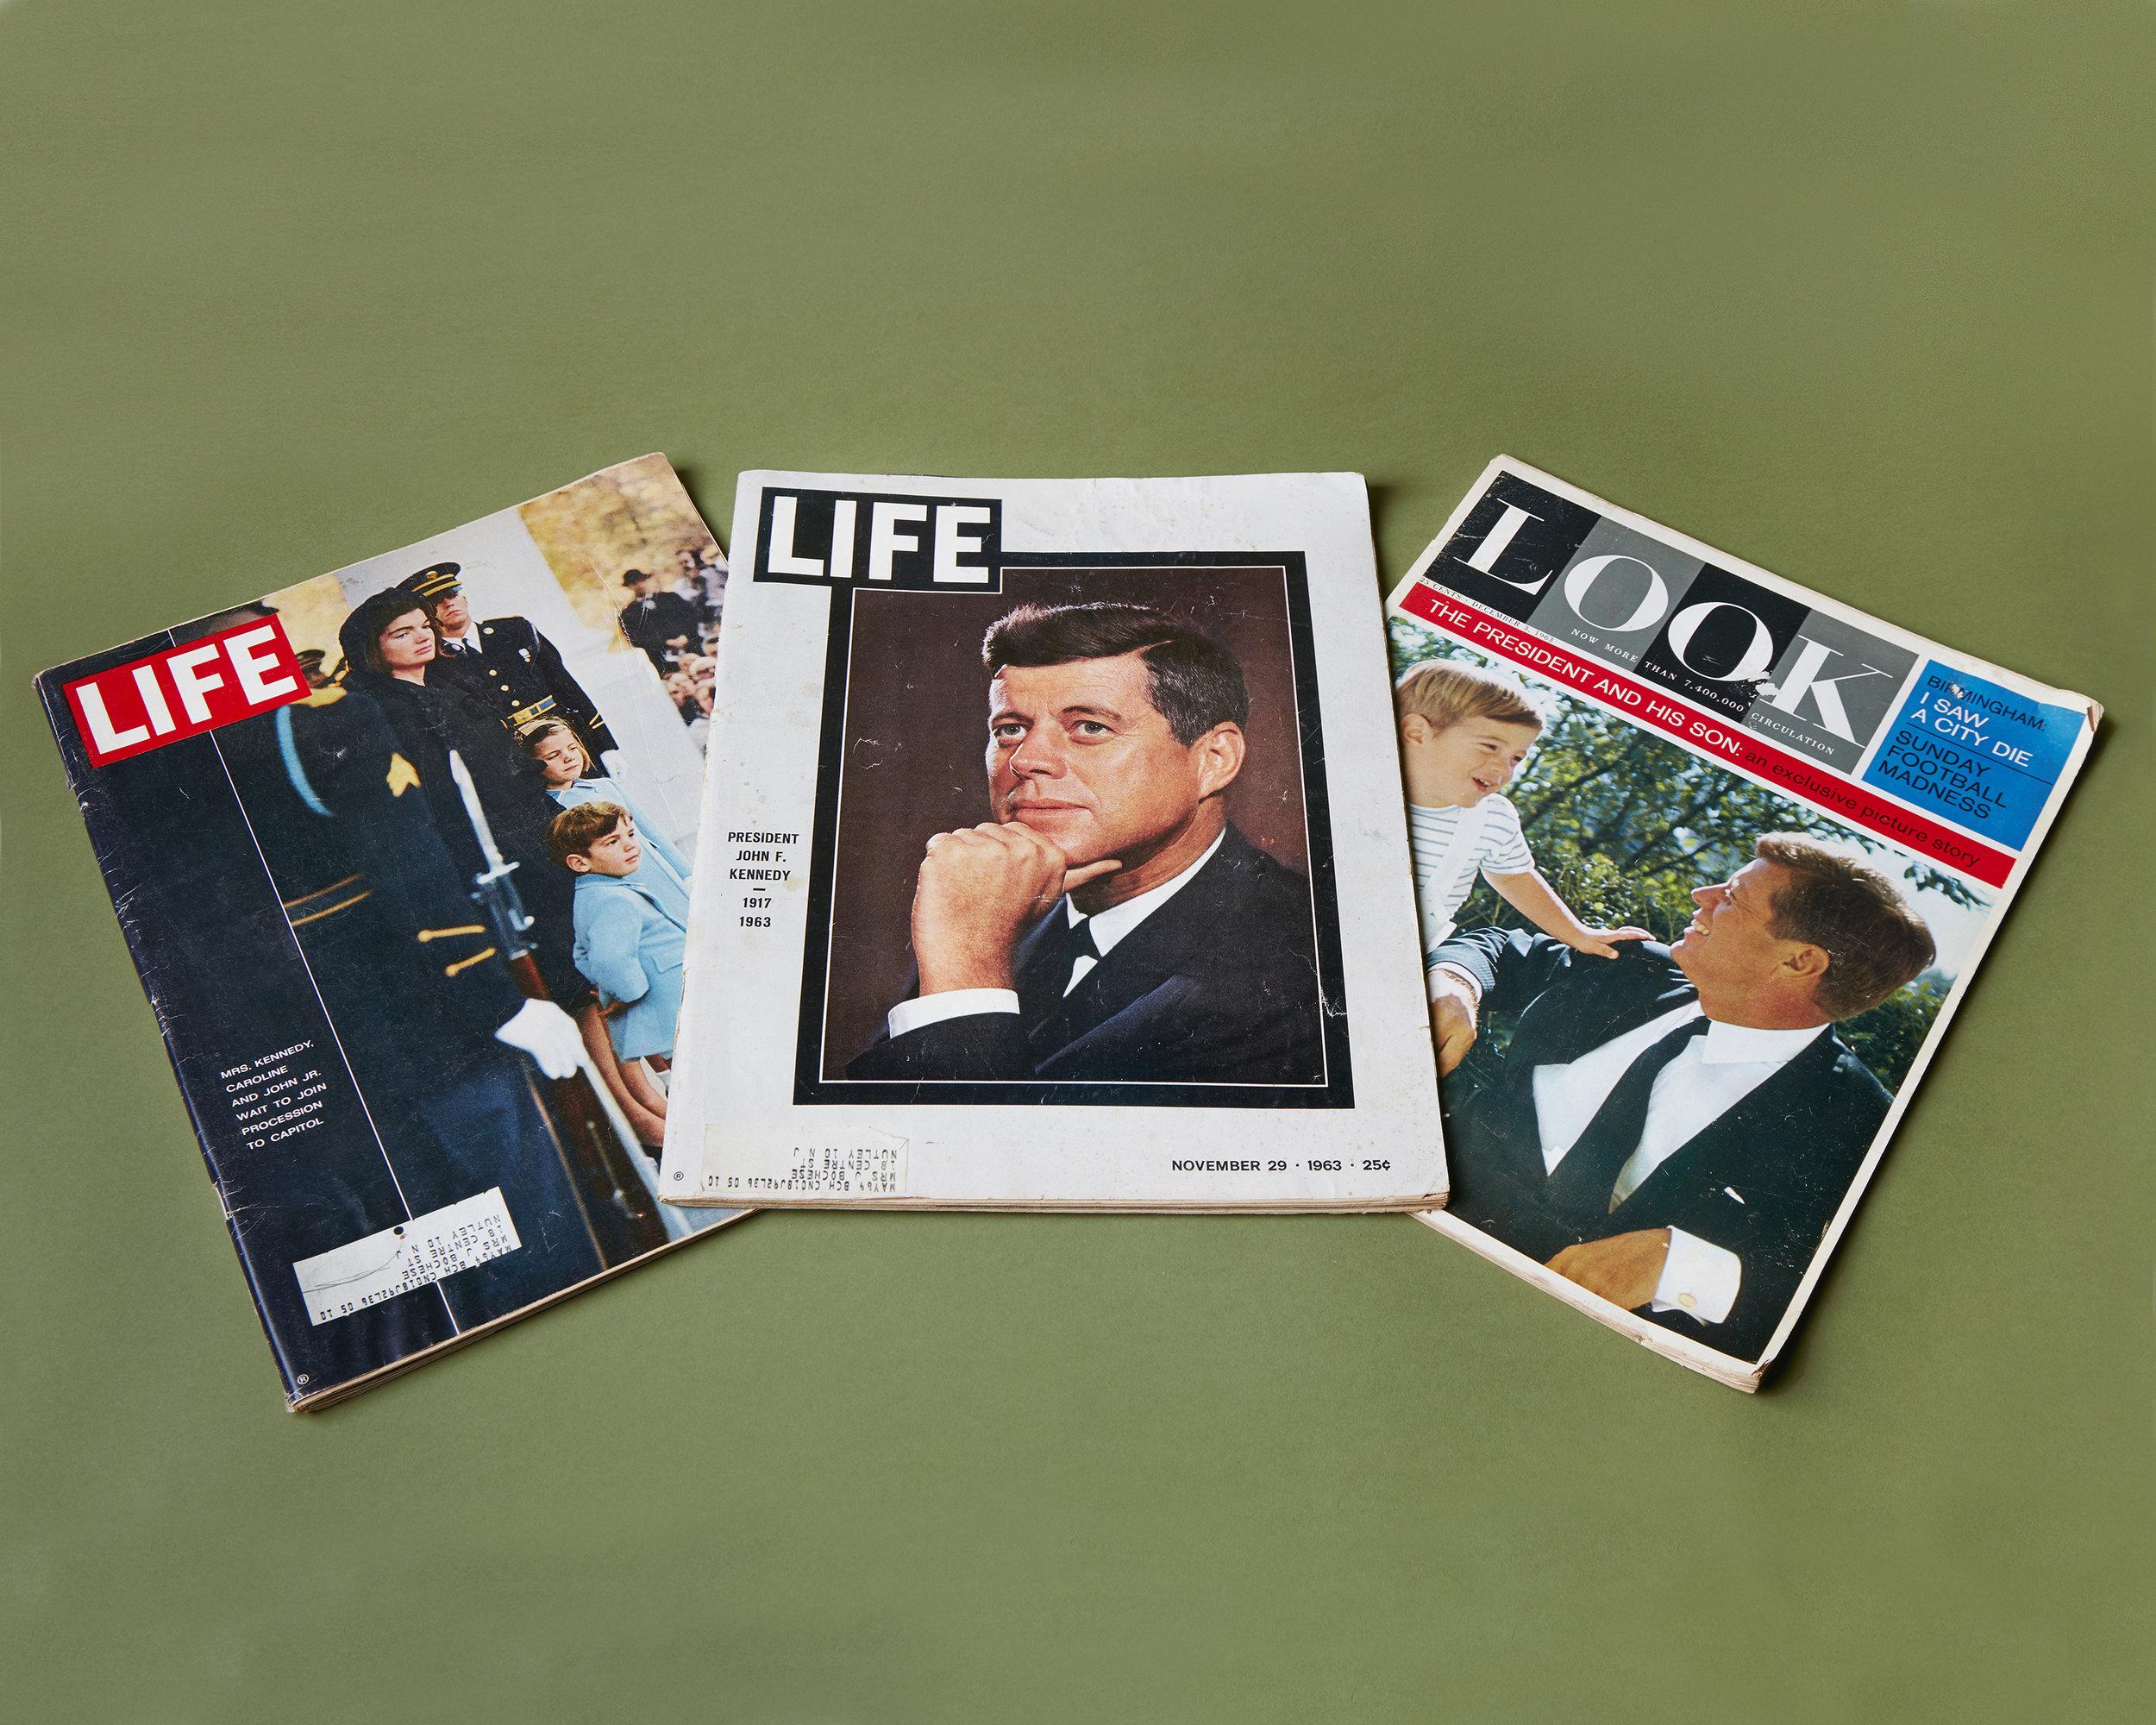 22_Grandparents_Magazines_retouched4x5.jpg